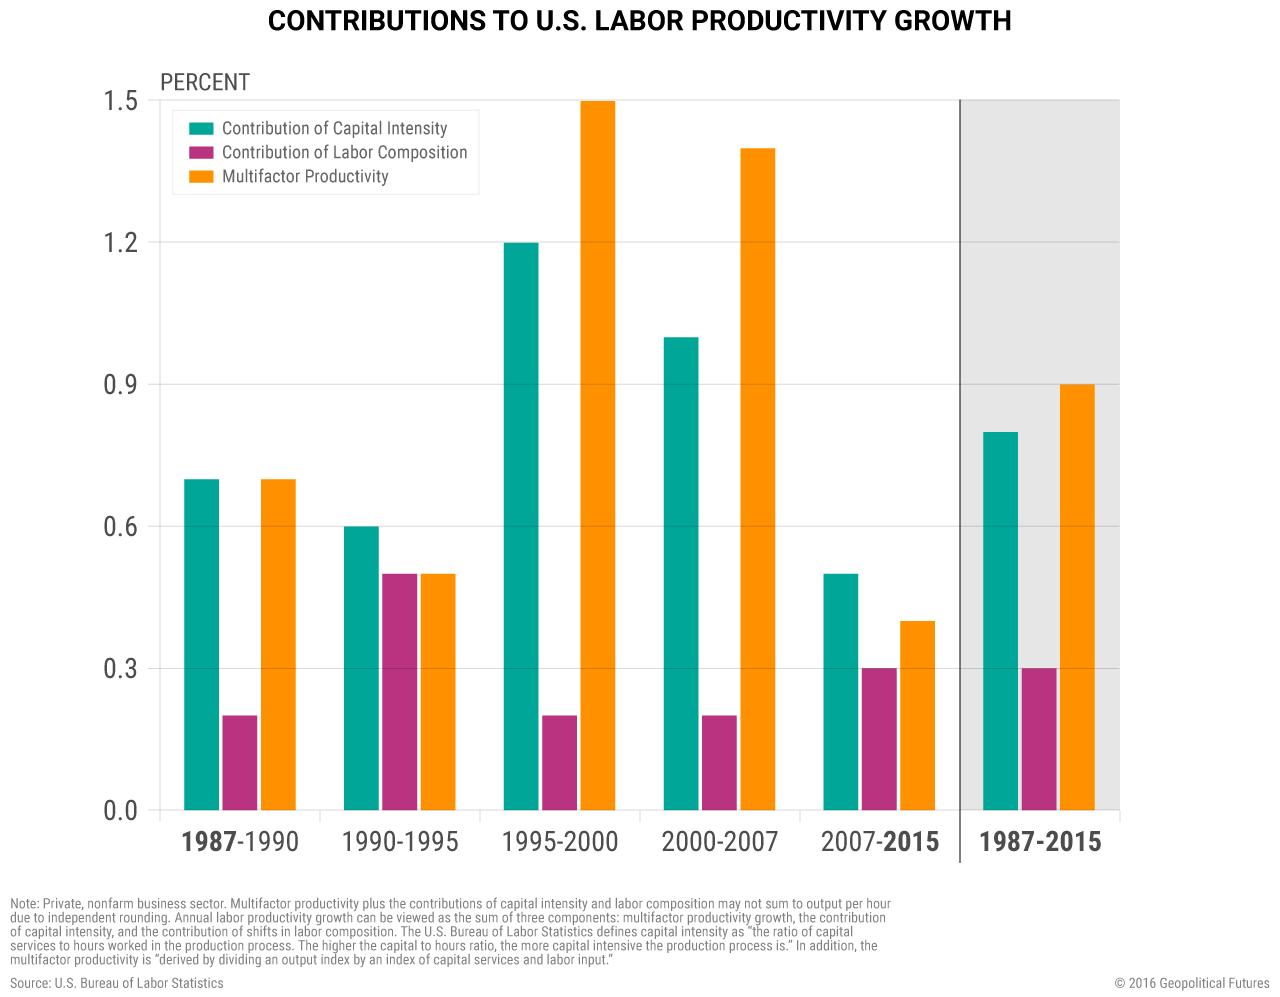 us-contributions-labor-productivity